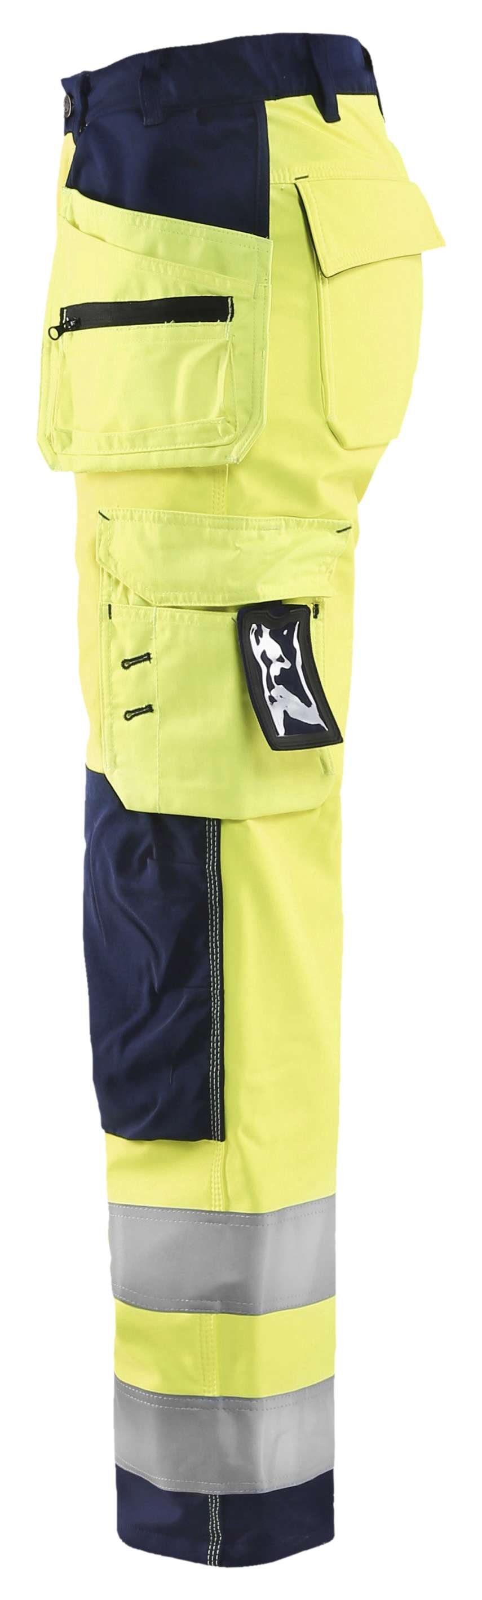 Blaklader Dames softshell werkbroeken 71672517 High Vis geel-marineblauw(3389)